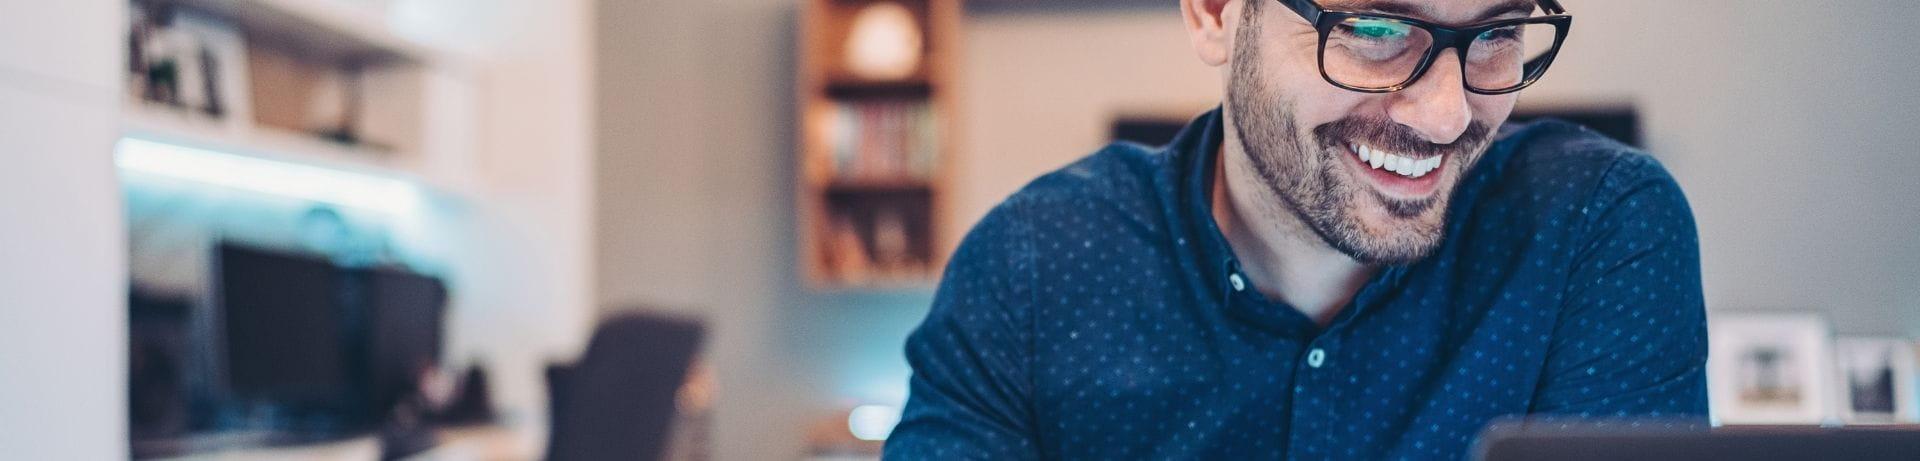 Attendance Management Software| Comprehensive Time Tracking | HR Software